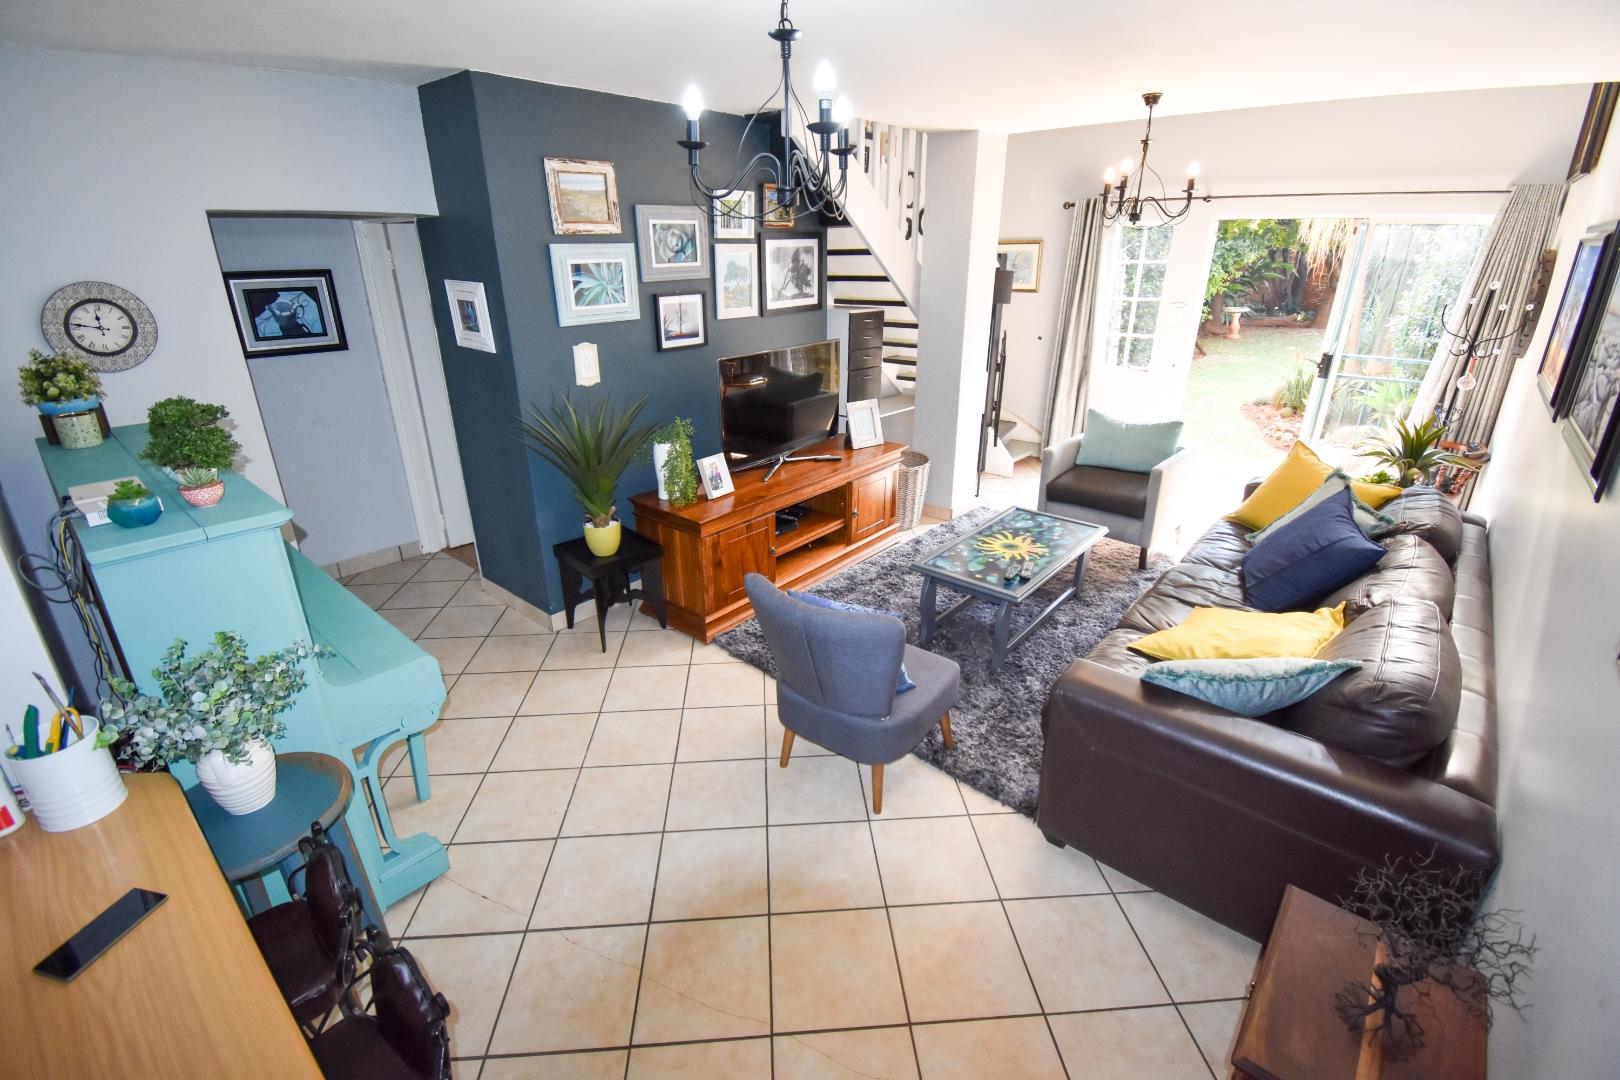 2 Bedroom Townhouse For Sale in Die Hoewes